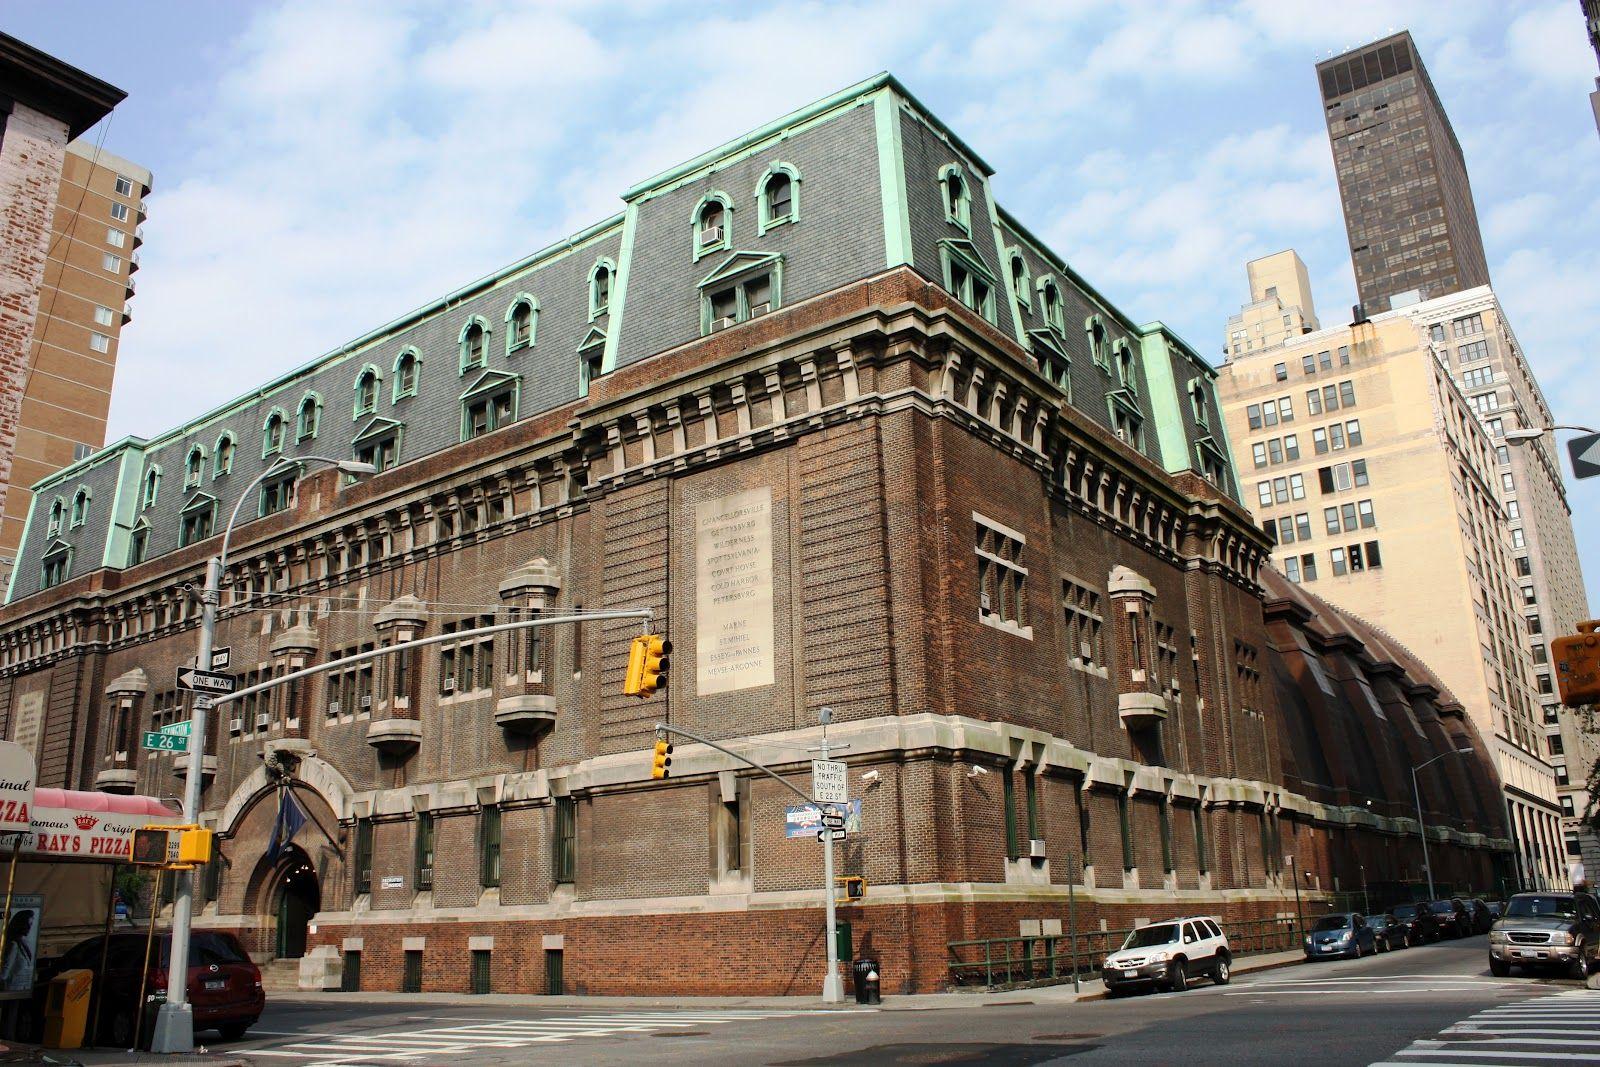 New York City Boroughs ~ Manhattan | 69th Regiment Armory (built in 1906), East 26th Street and Lexington Avenue